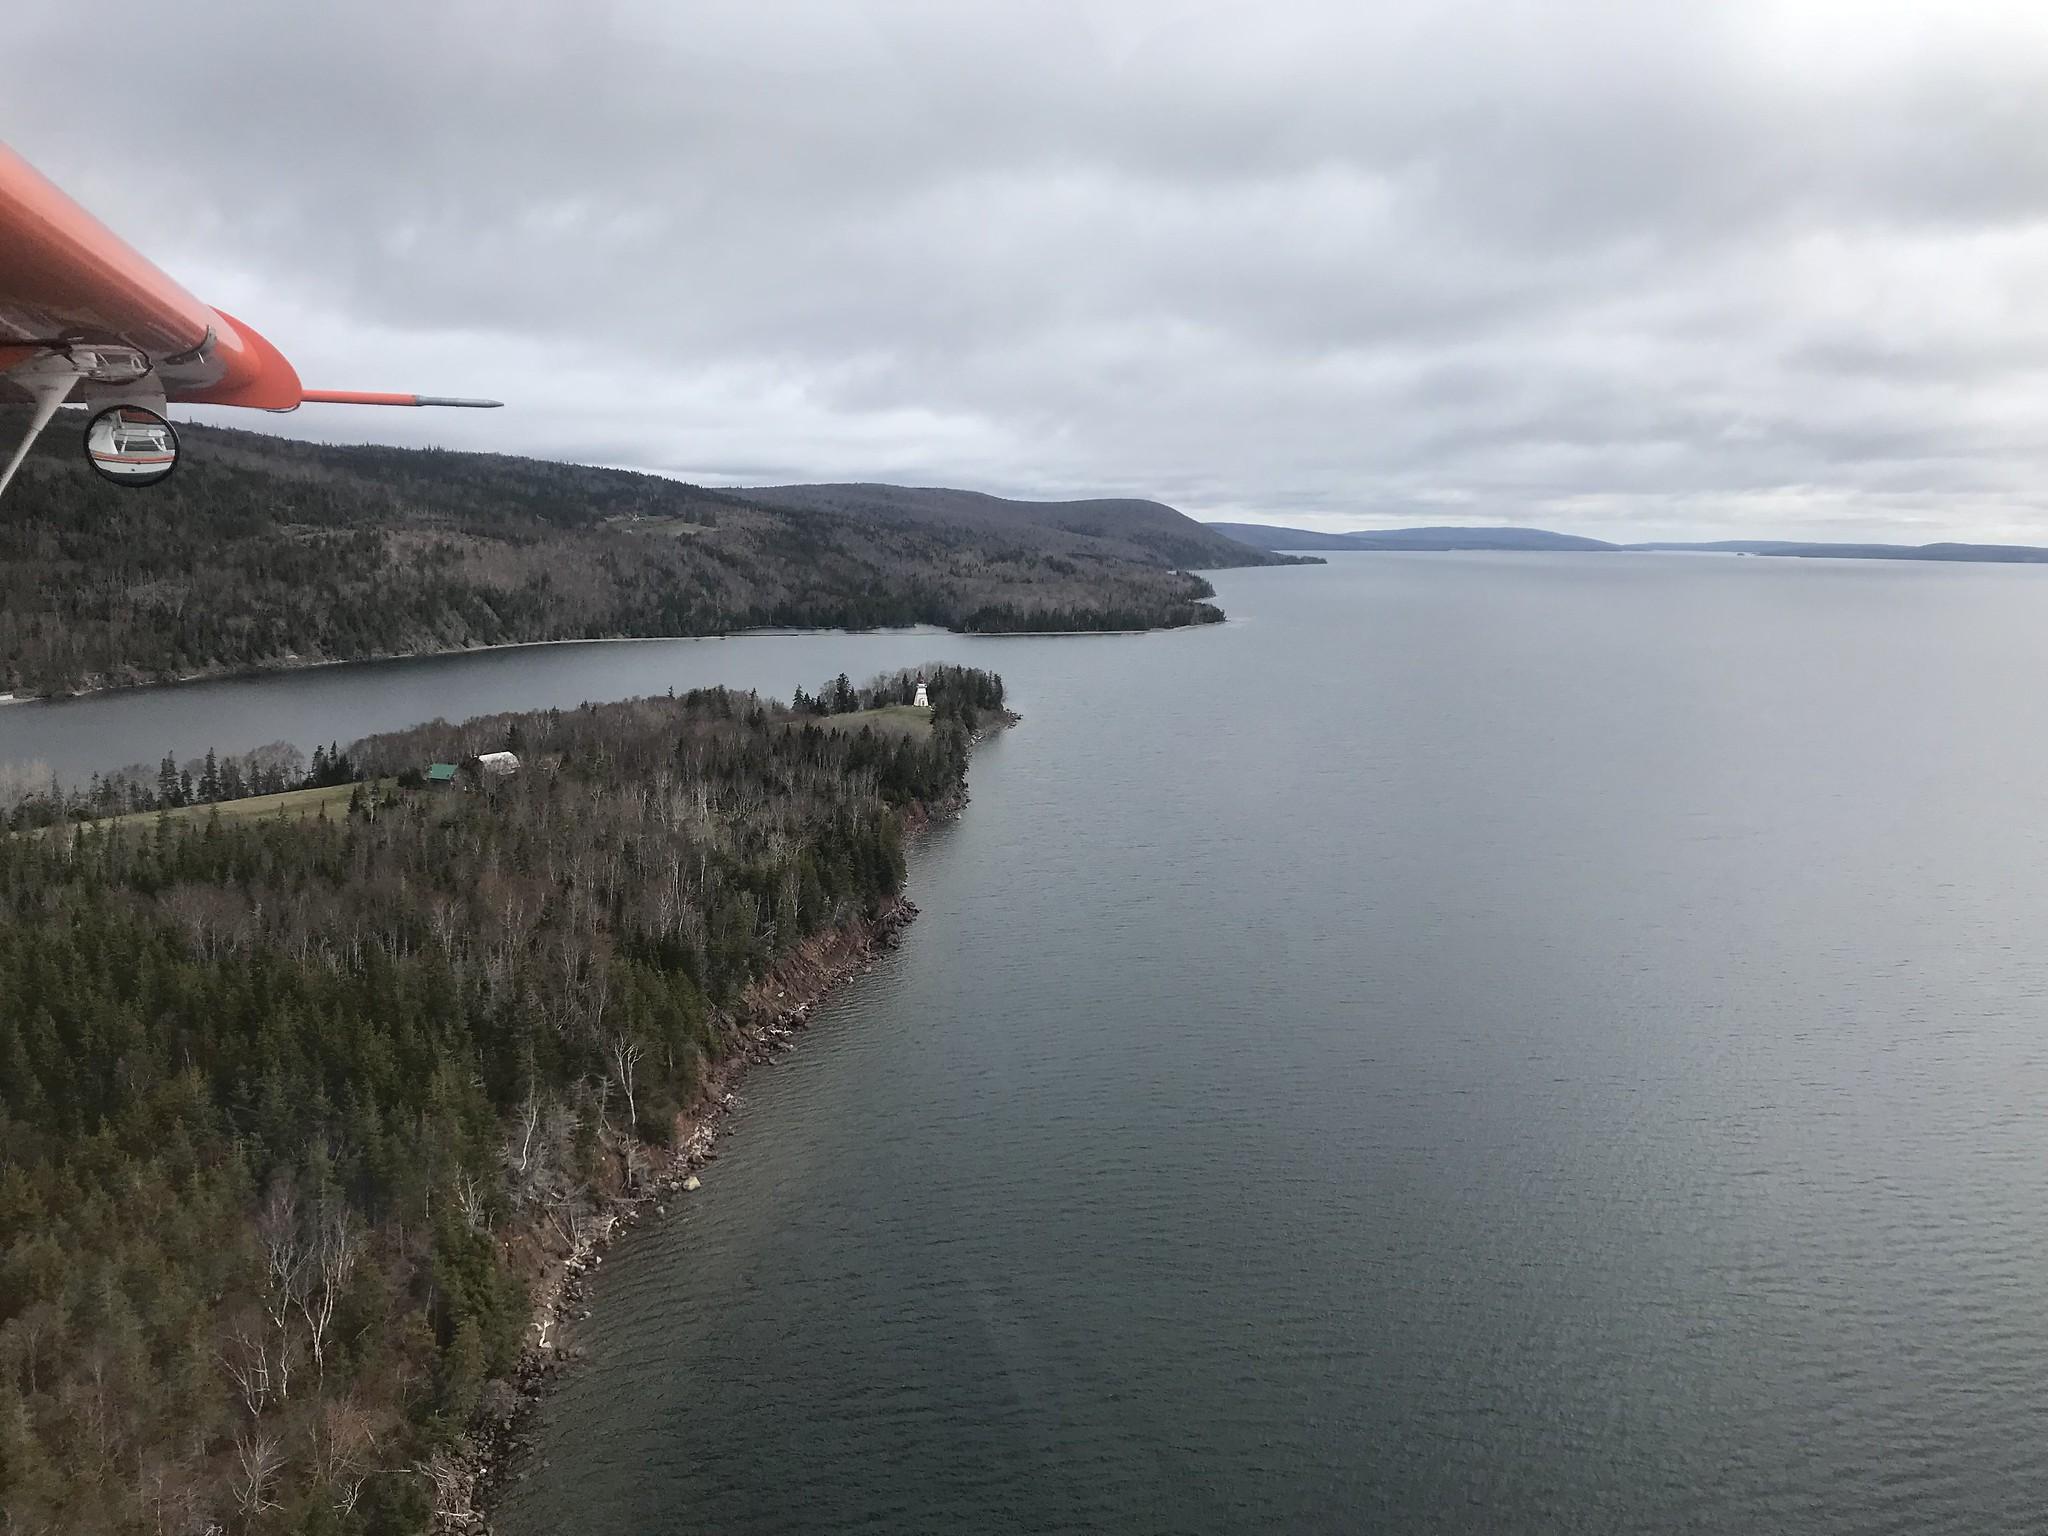 Dropping down off the Cape Breton Highlands near Sydney, Nova Scotia. USFWS